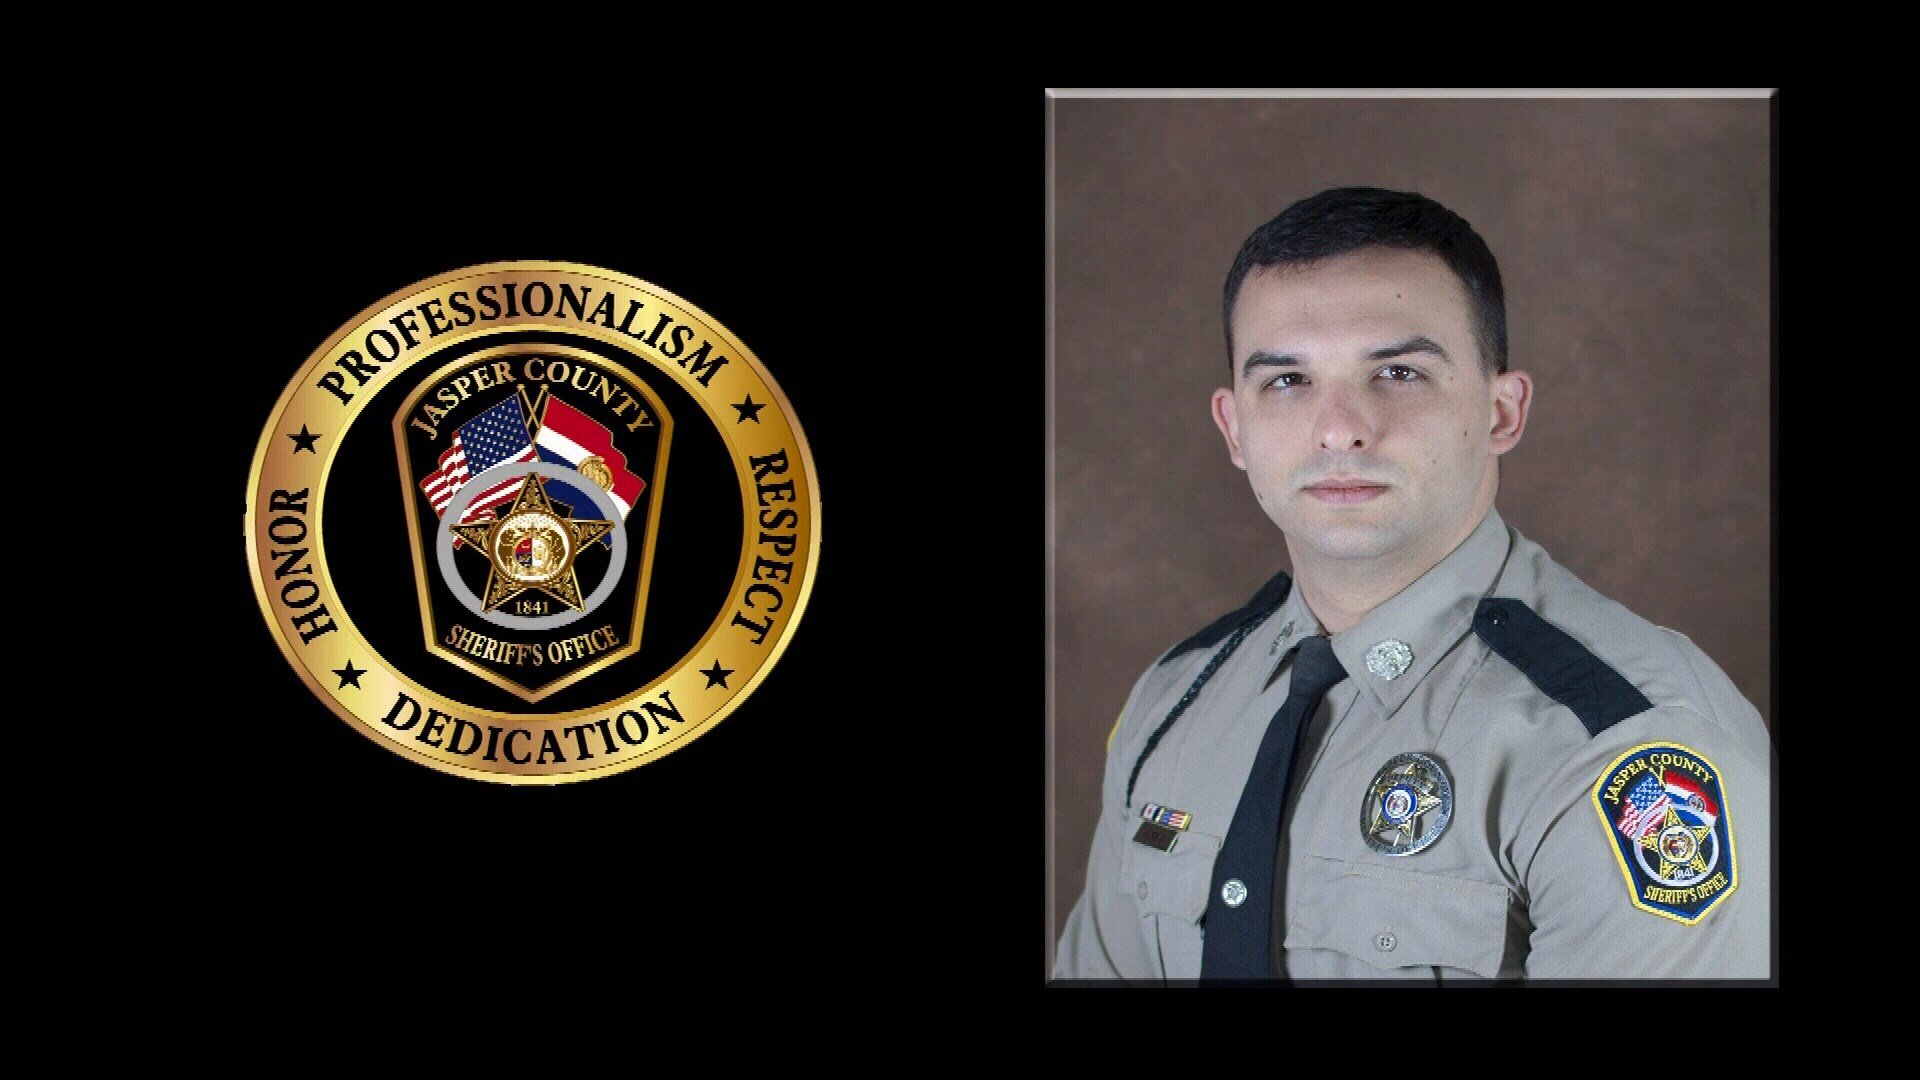 Deputy Nolan Murray